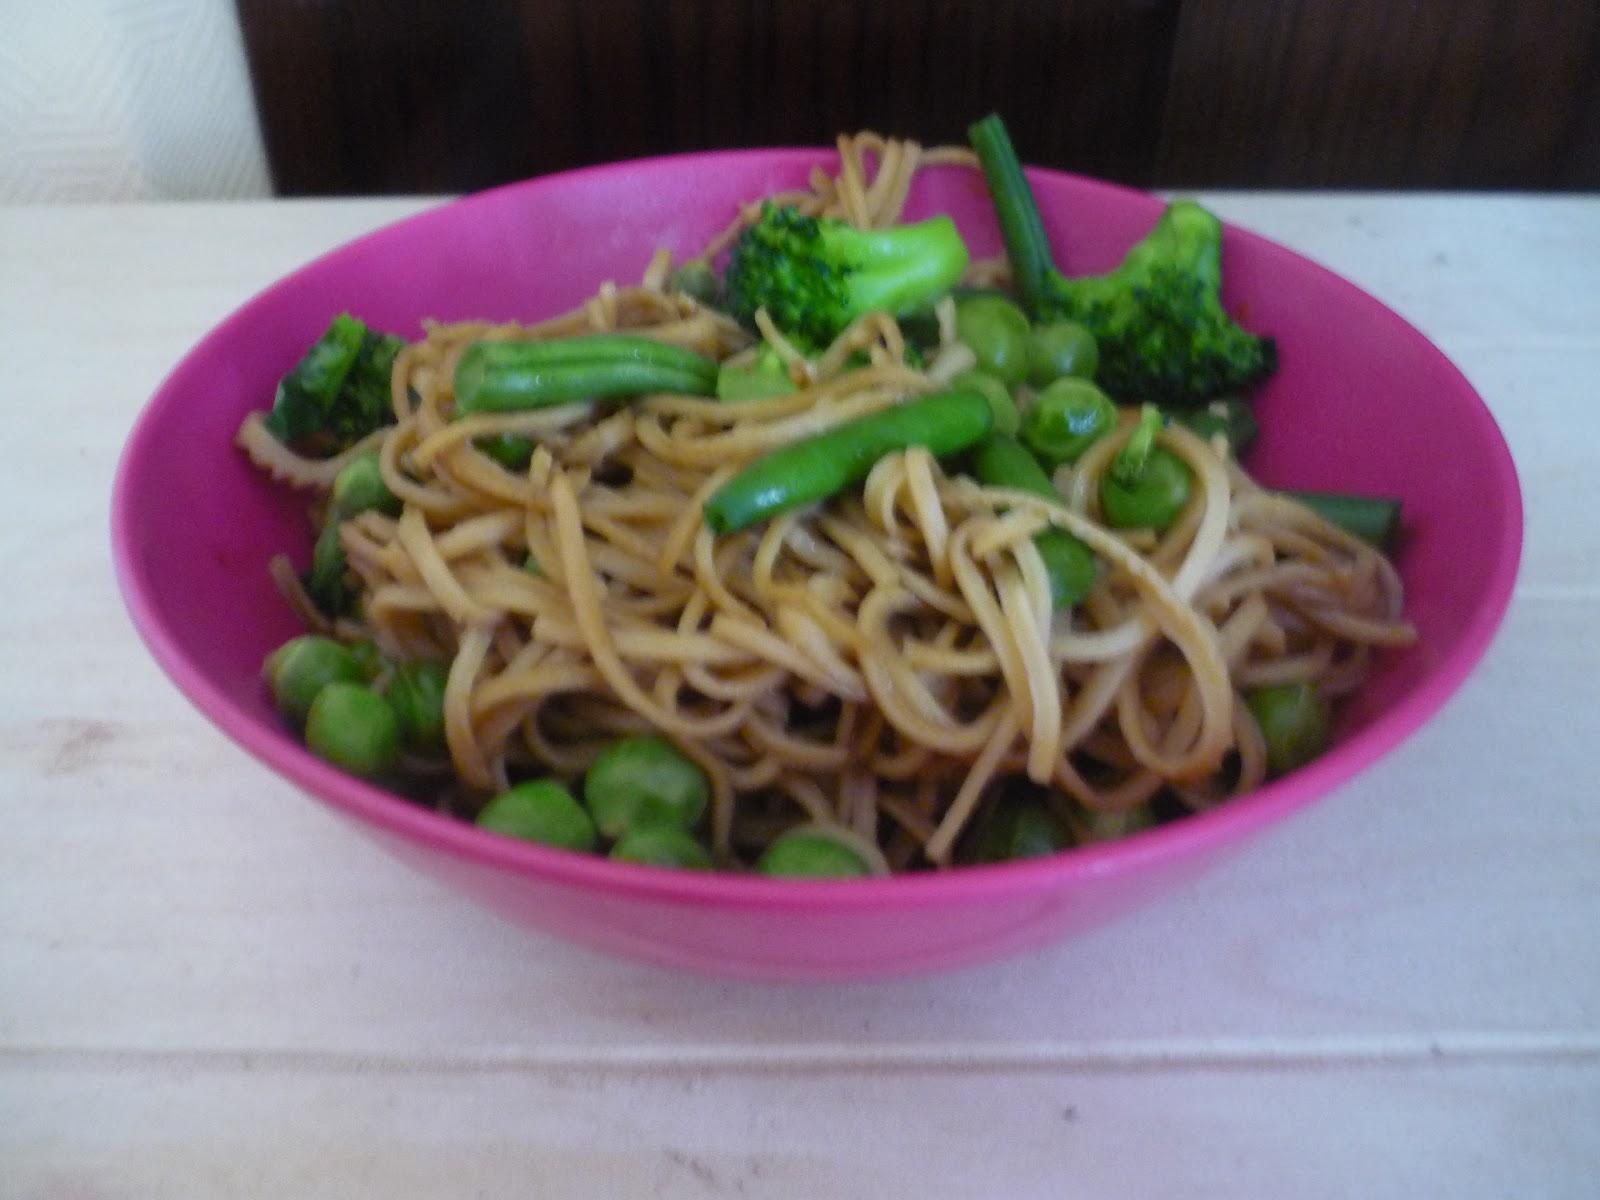 https://cuillereetsaladier.blogspot.com/2013/04/spaghettis-de-soja-sautees-au-vert.html